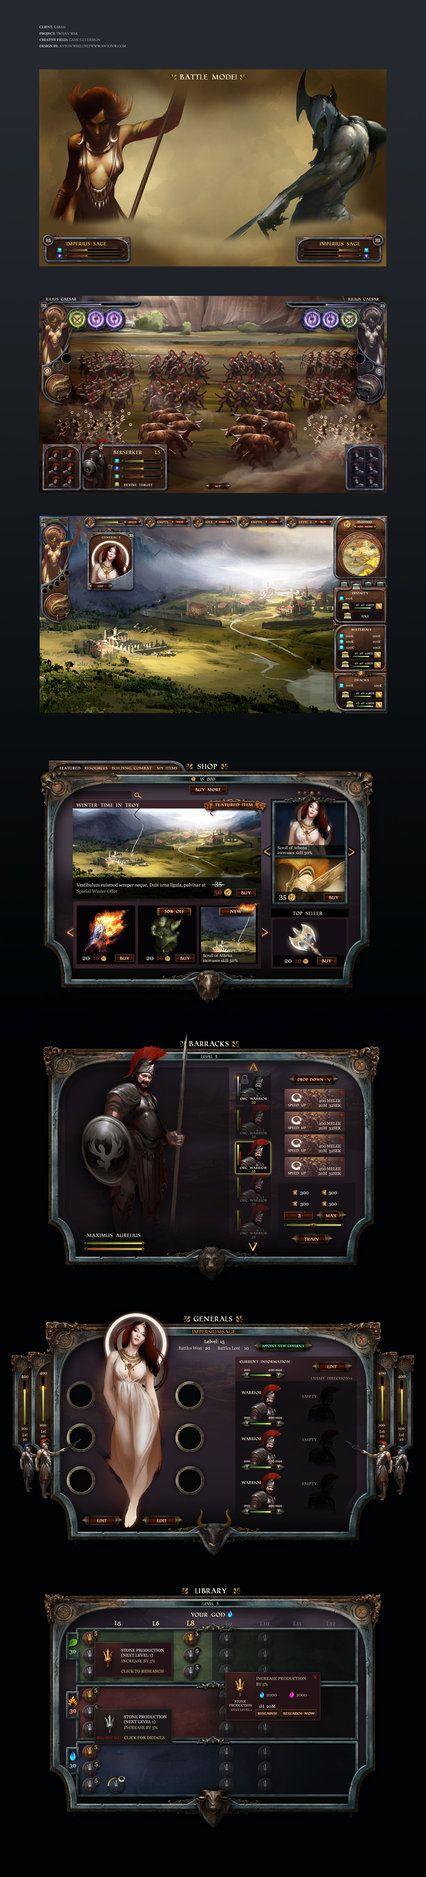 Trojan War - Web Browser Game by karsten